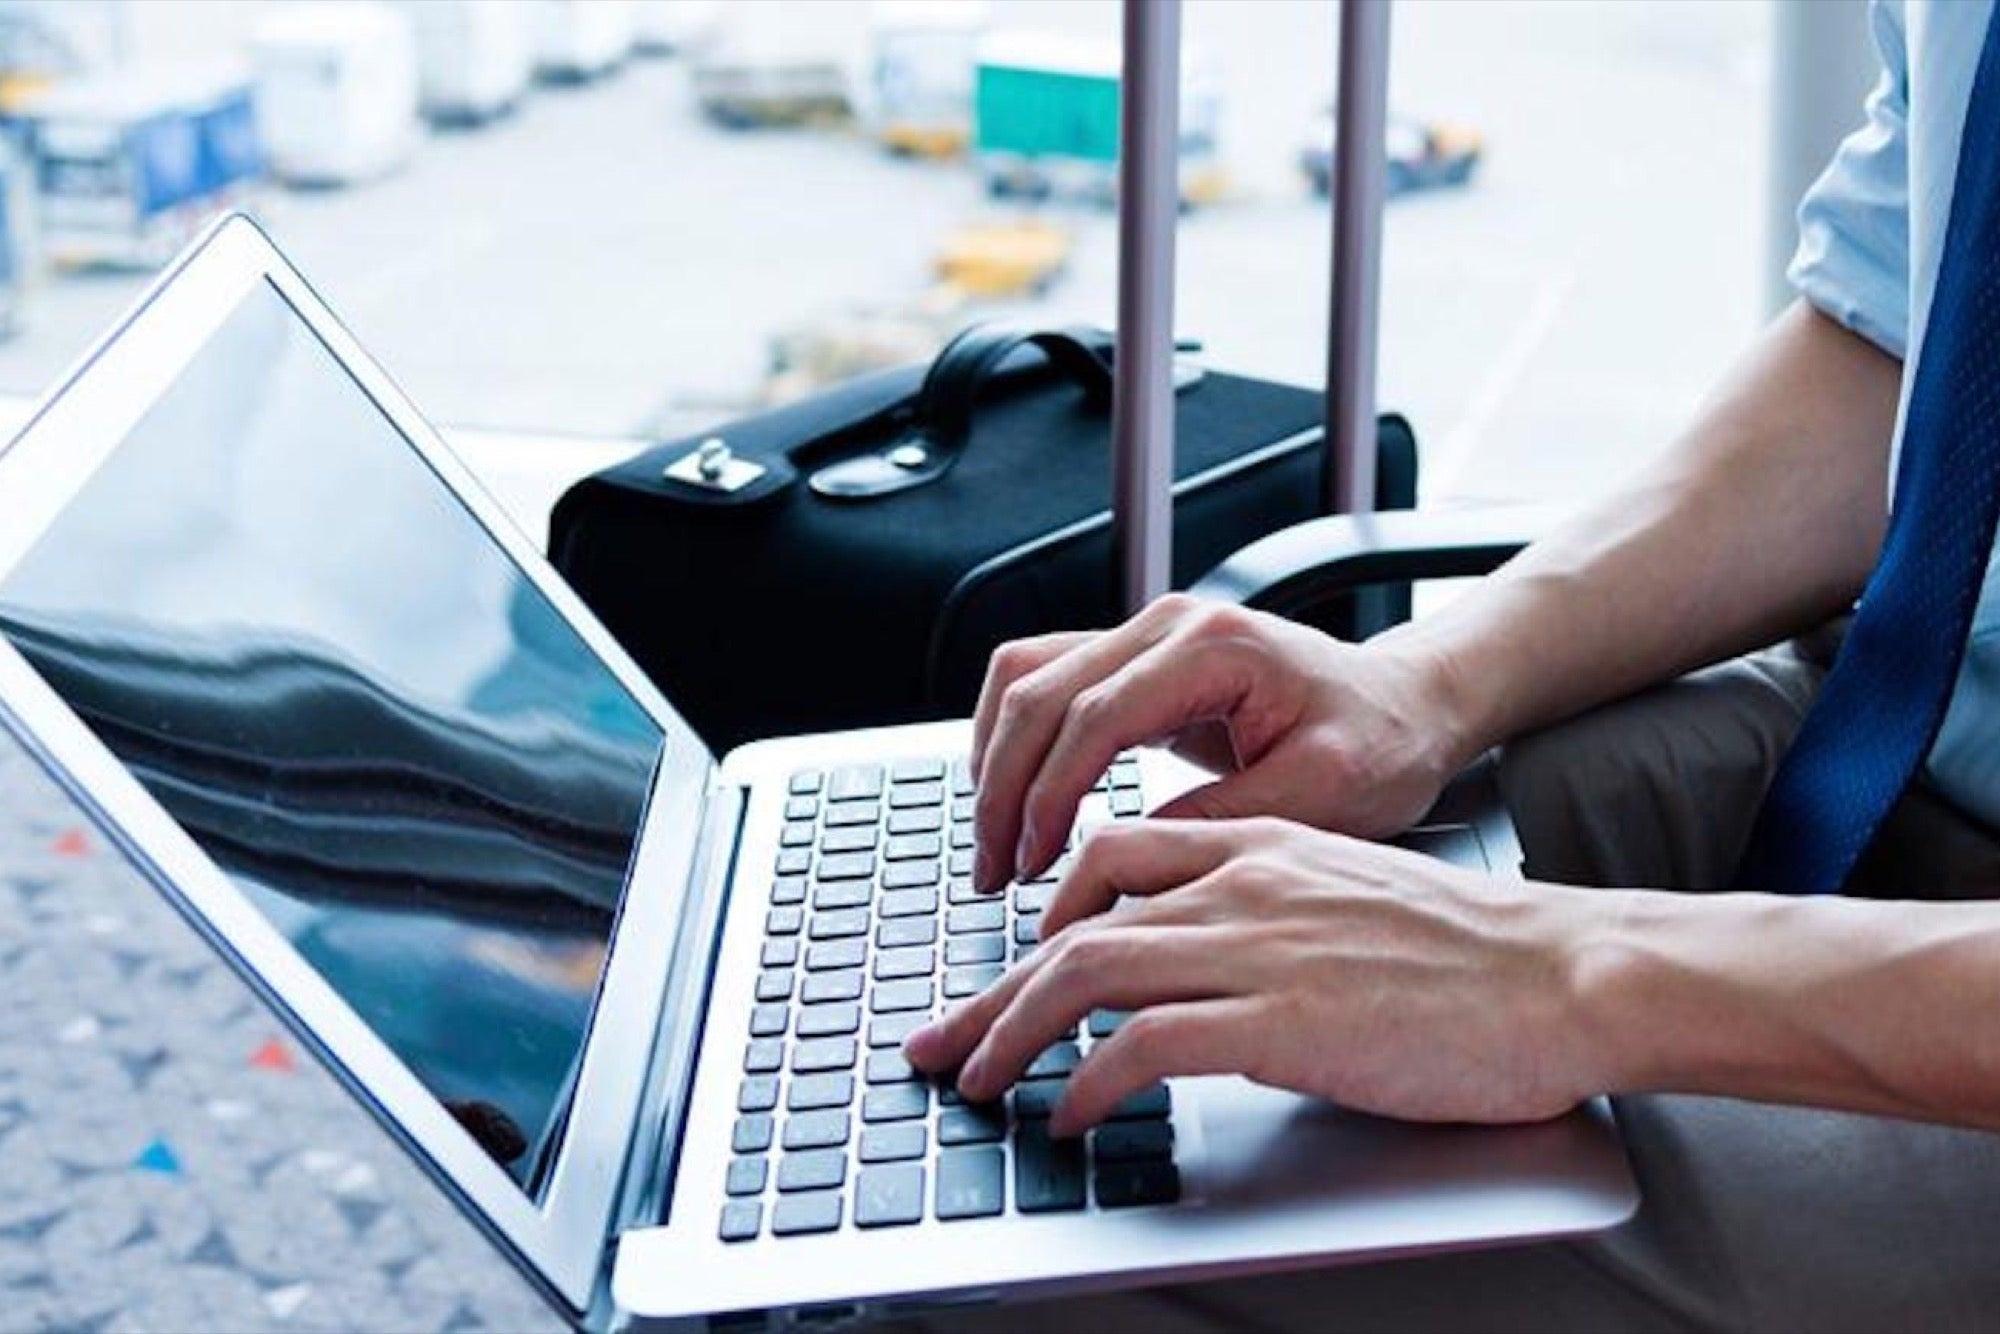 Entenda como o conceito de Internet das Coisas adentra no setor logístico